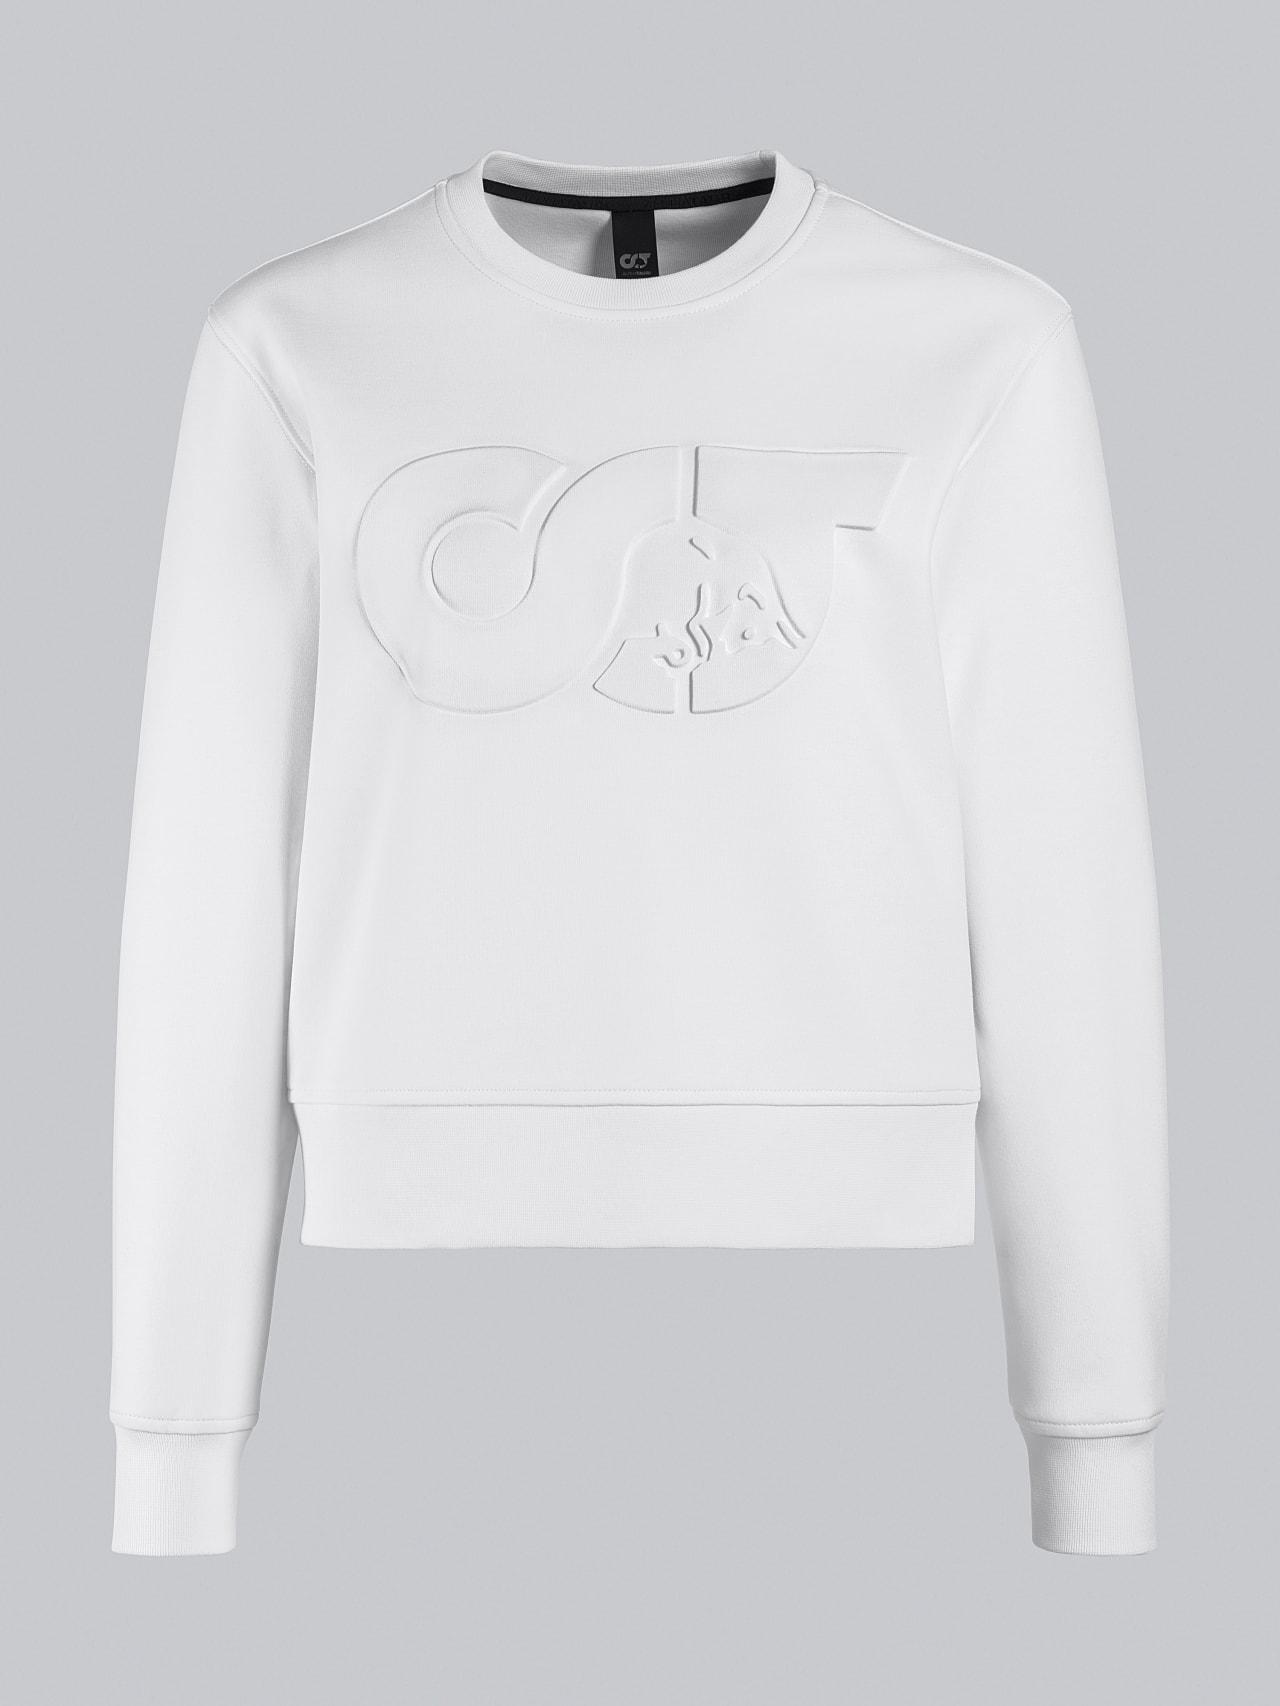 SHINT V1.Y5.02 Premium Logo Sweater offwhite Back Alpha Tauri